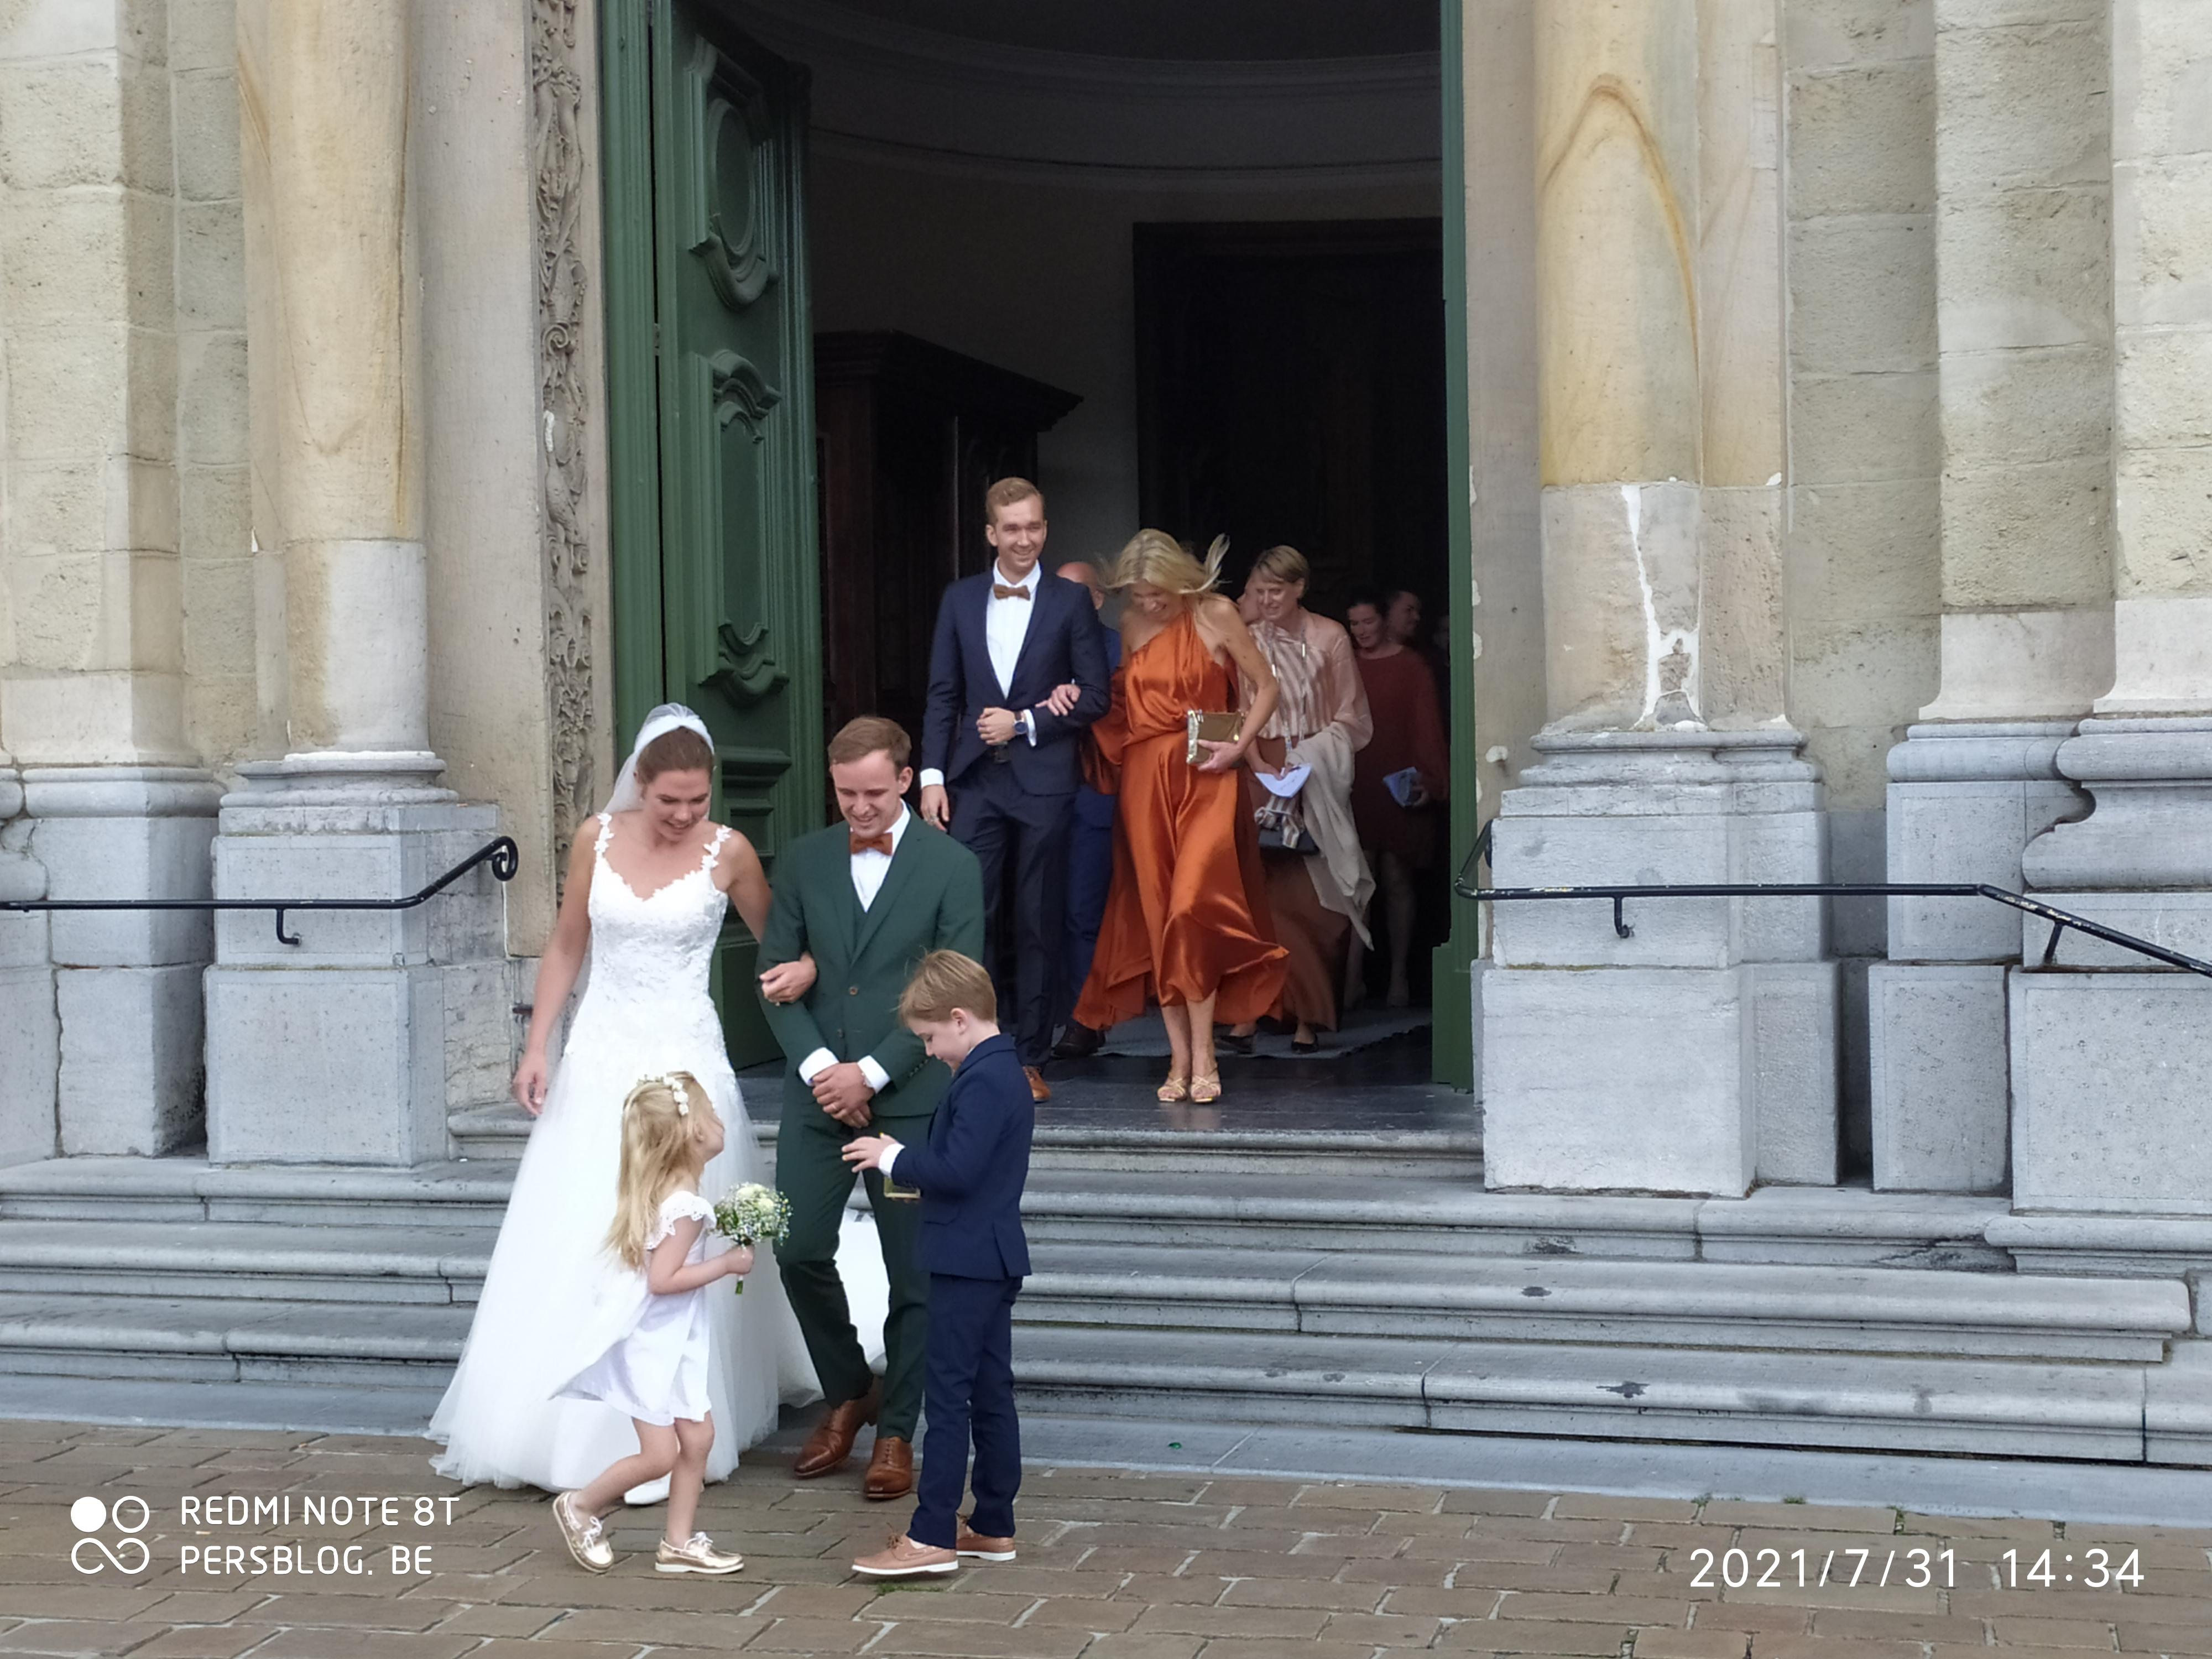 9 Sint-Pietersplein - Sint-Pieterskerk - huwelijk - oldtimers (13)